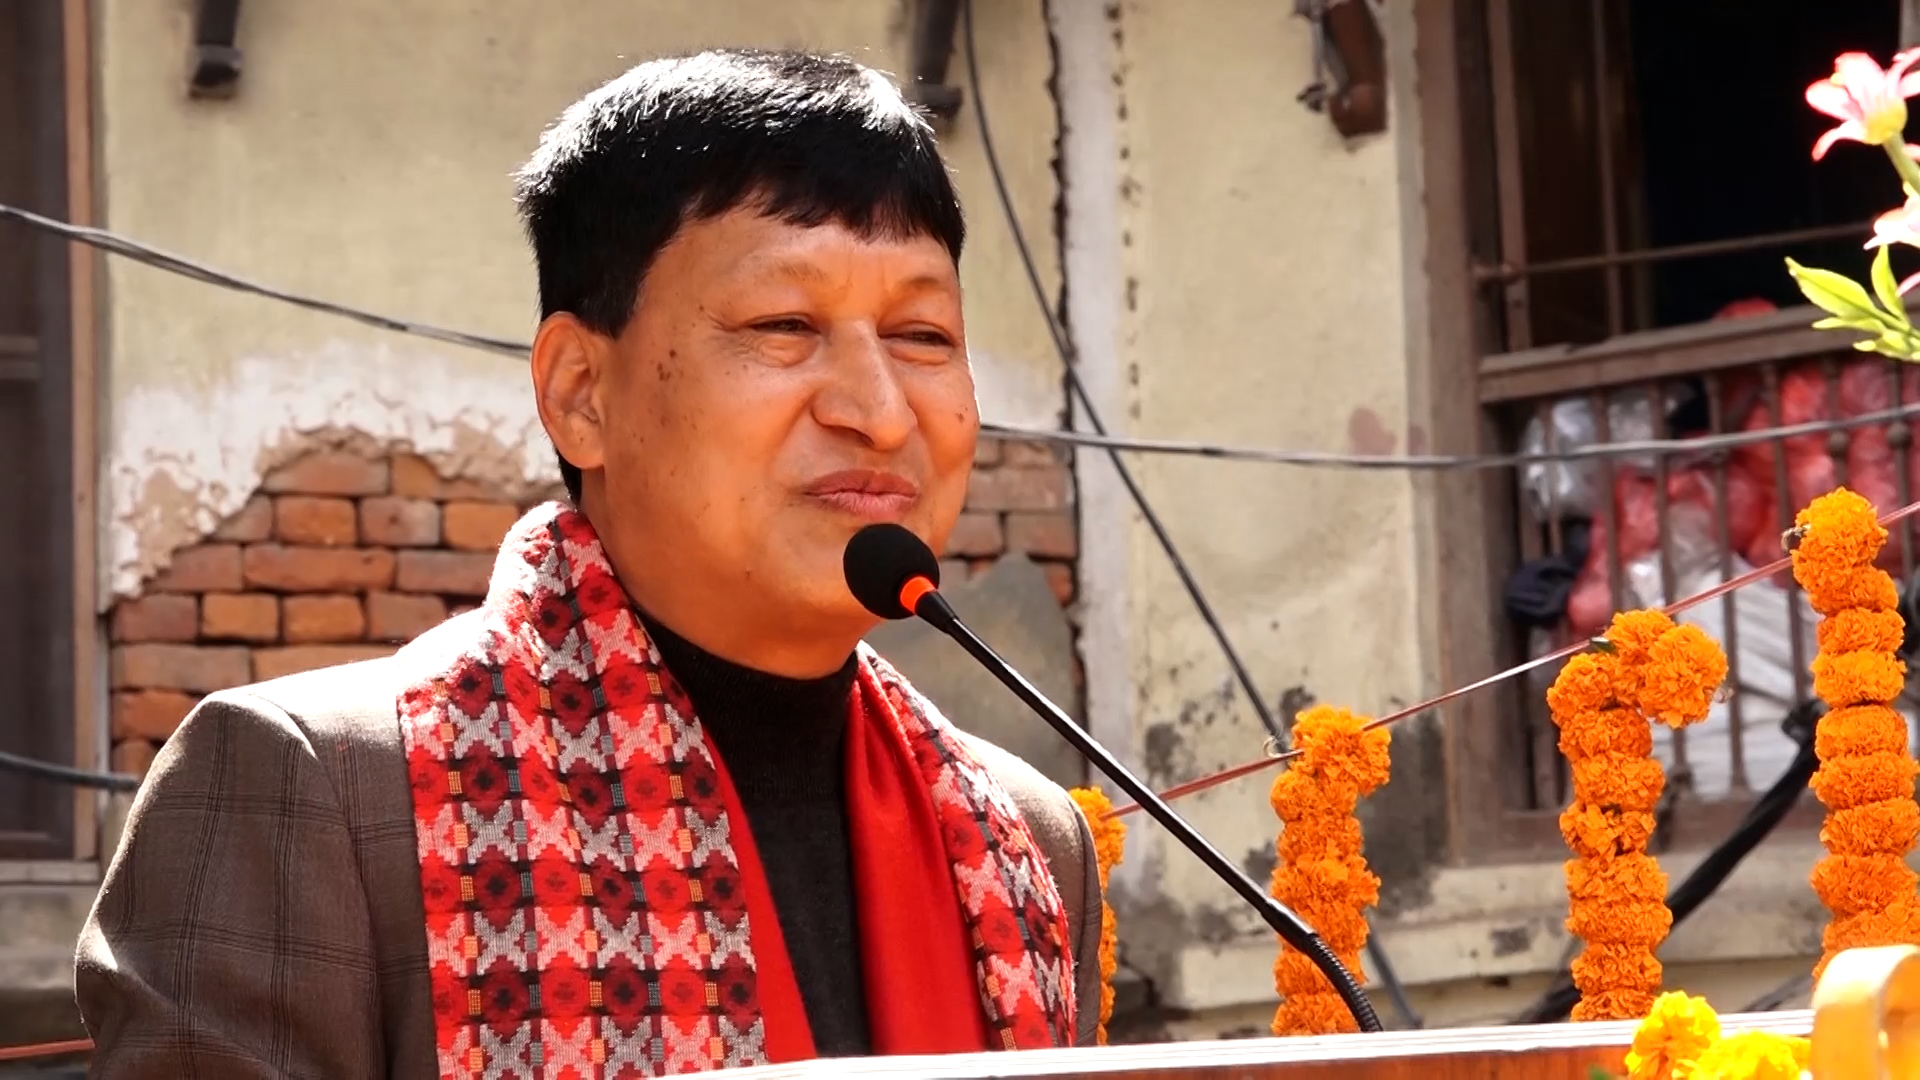 मेलम्ची बाढीपीडितलाई काठमाडौं महानगरले २ कराेड दिने